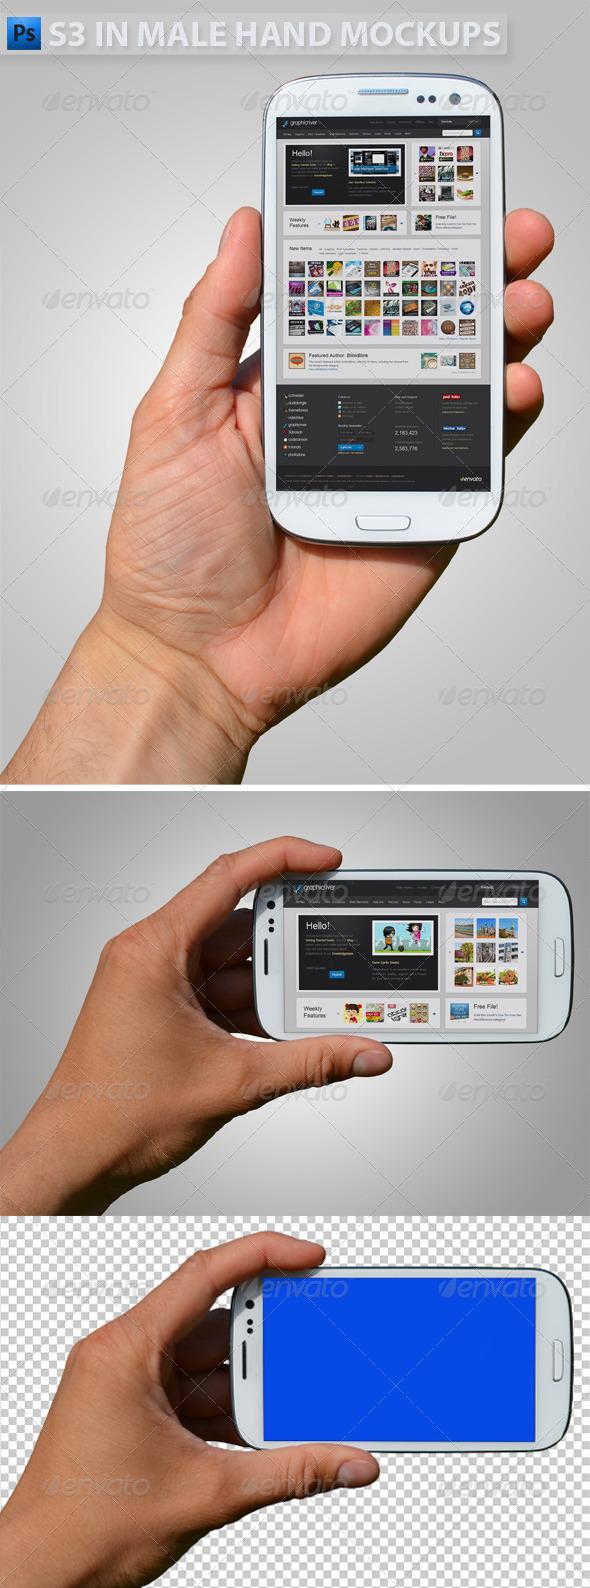 S3 in Hand Mock-ups - Mobile Displays